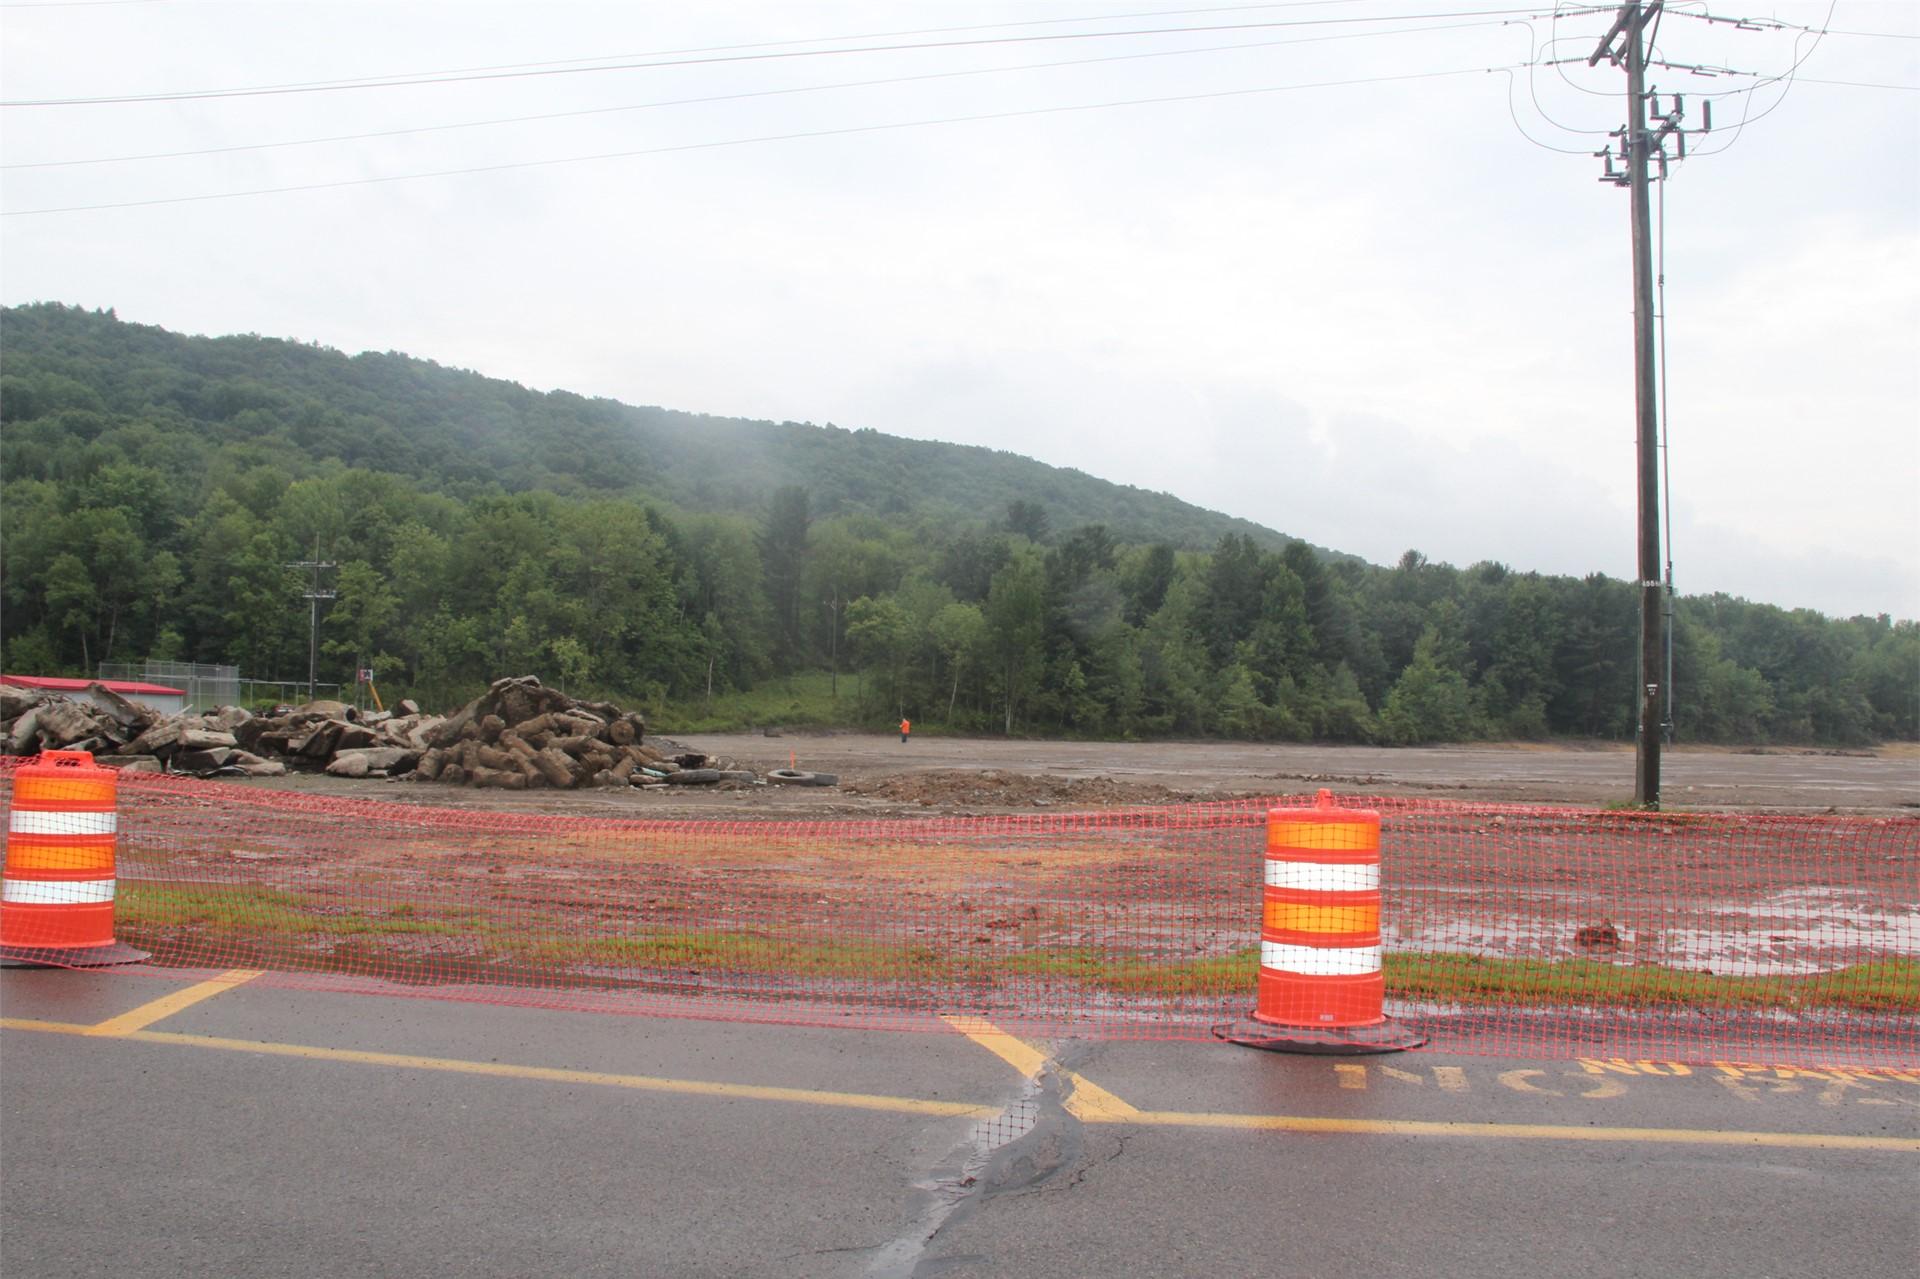 wide shot of cones in front of construction scene field